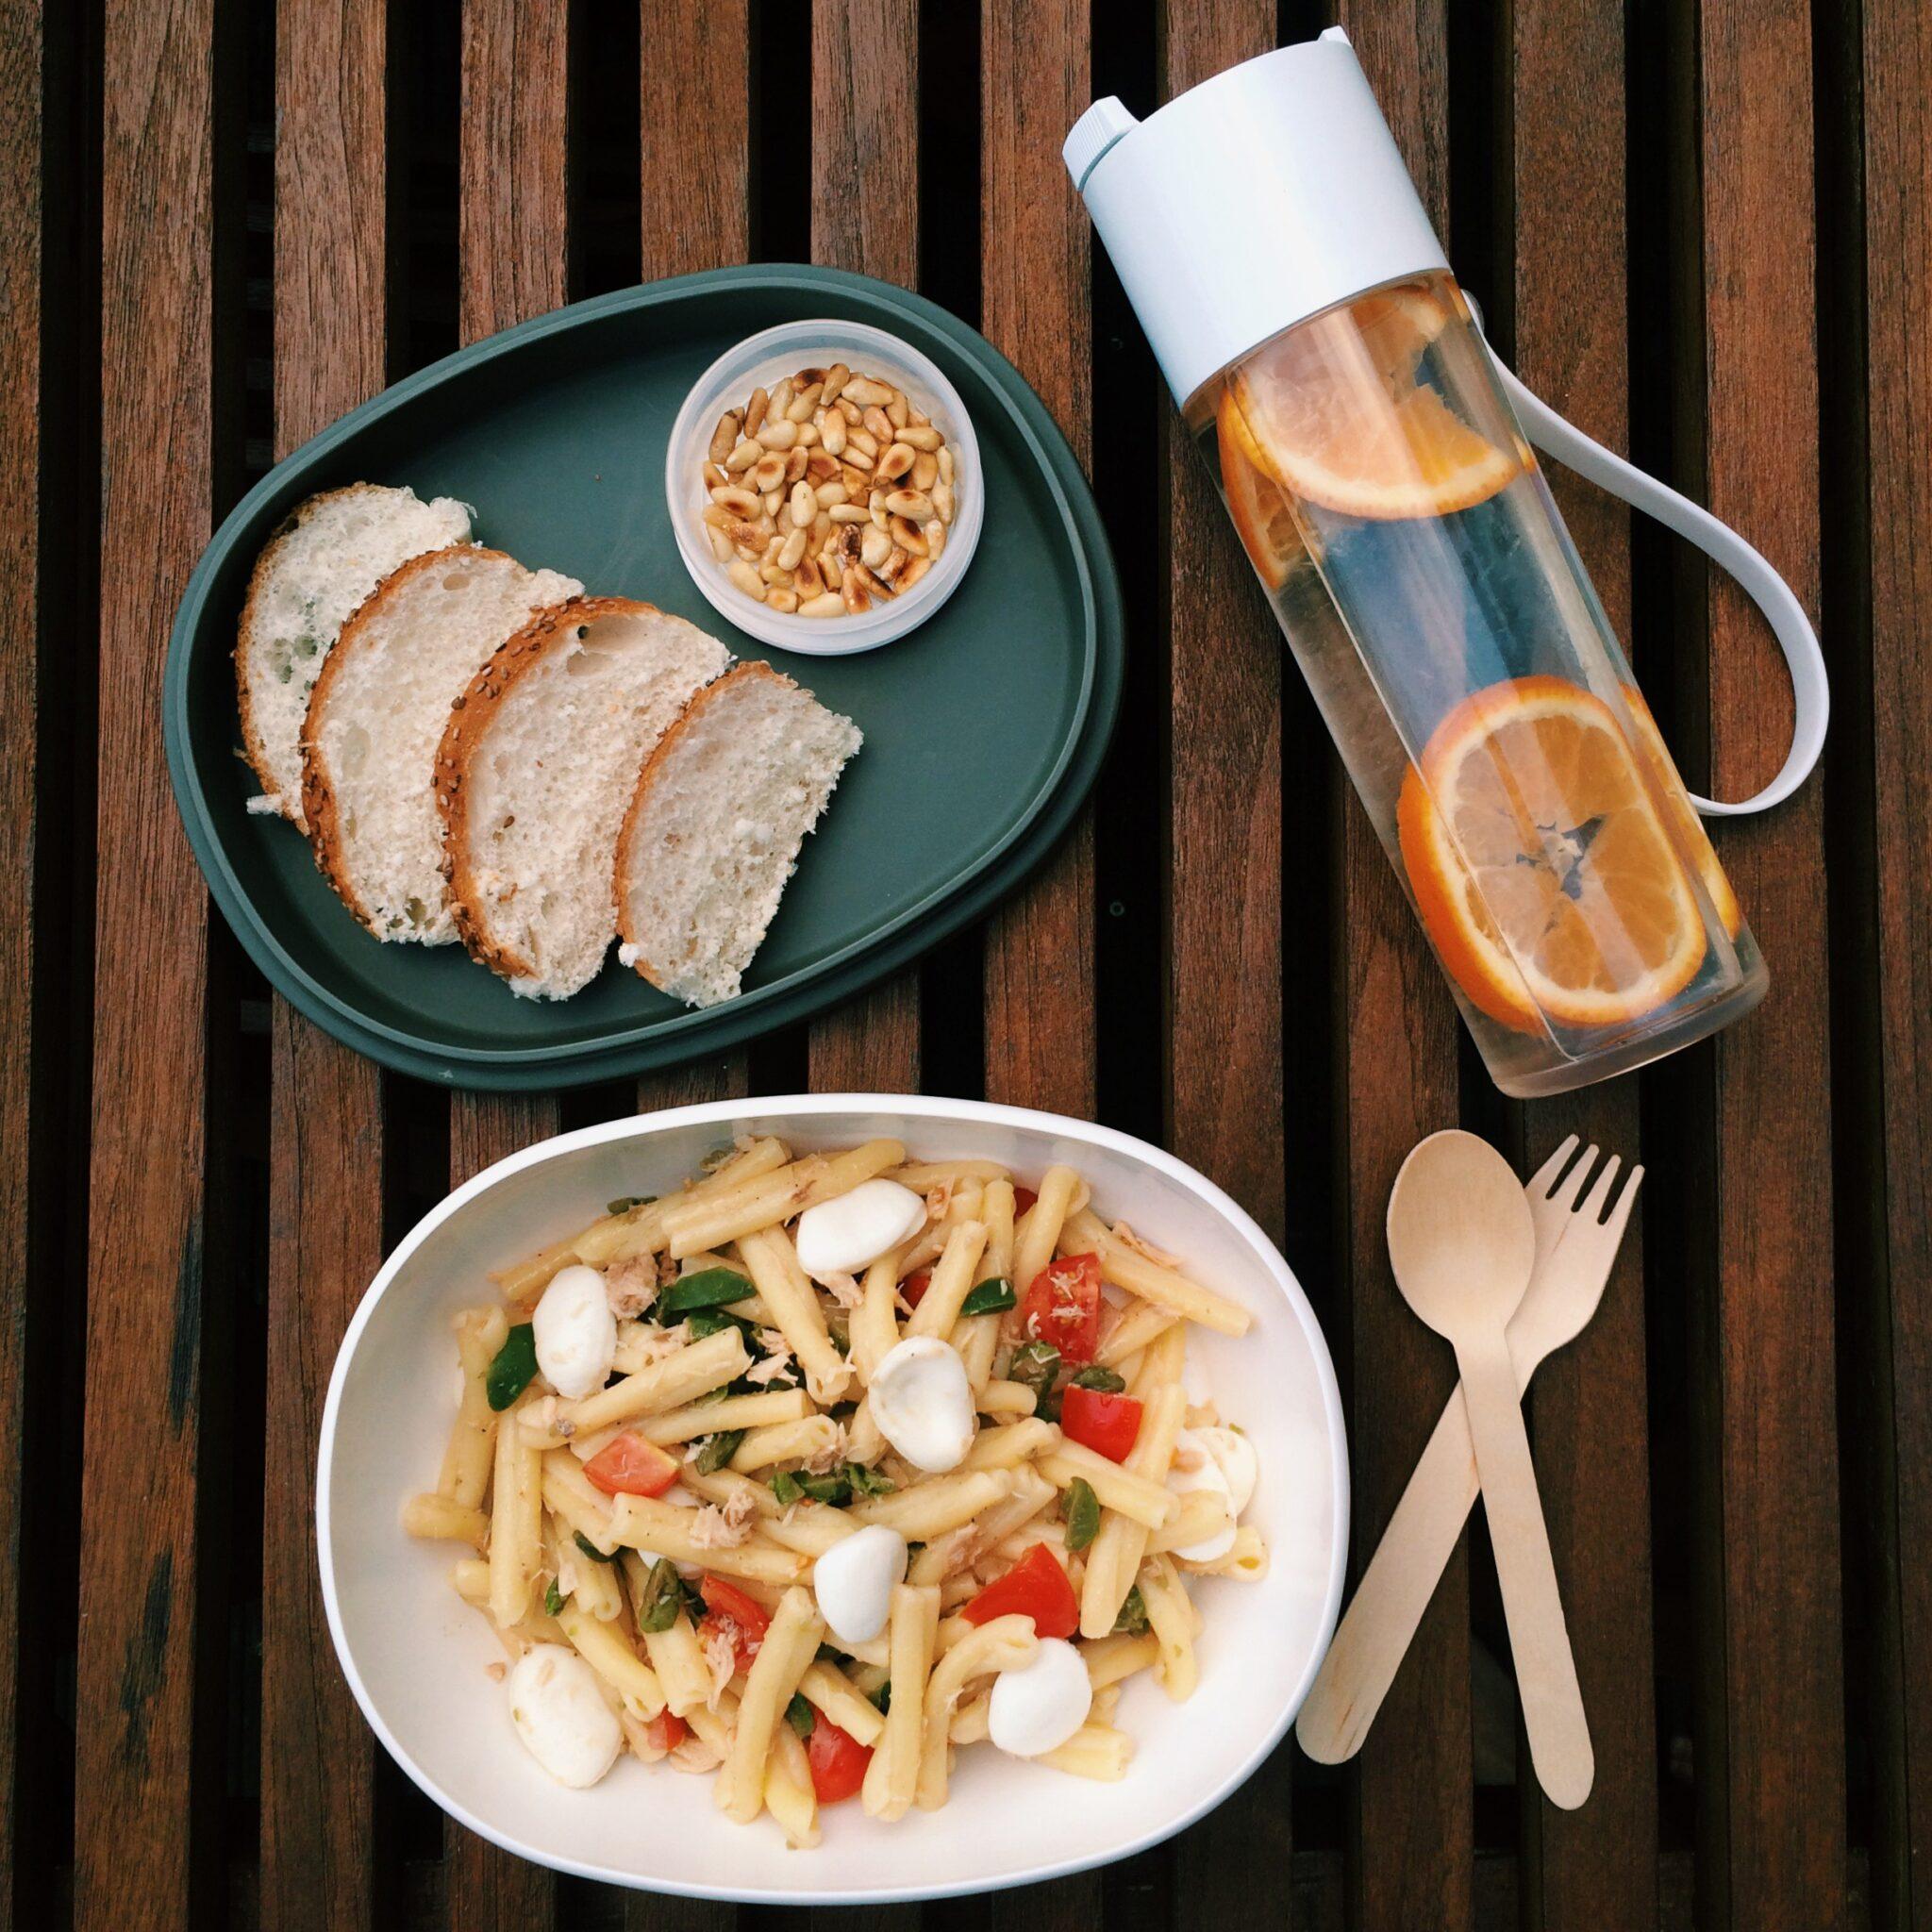 IMG 5407 e1411296413633 - Italian Pasta salad + Give away Rosti Mepal